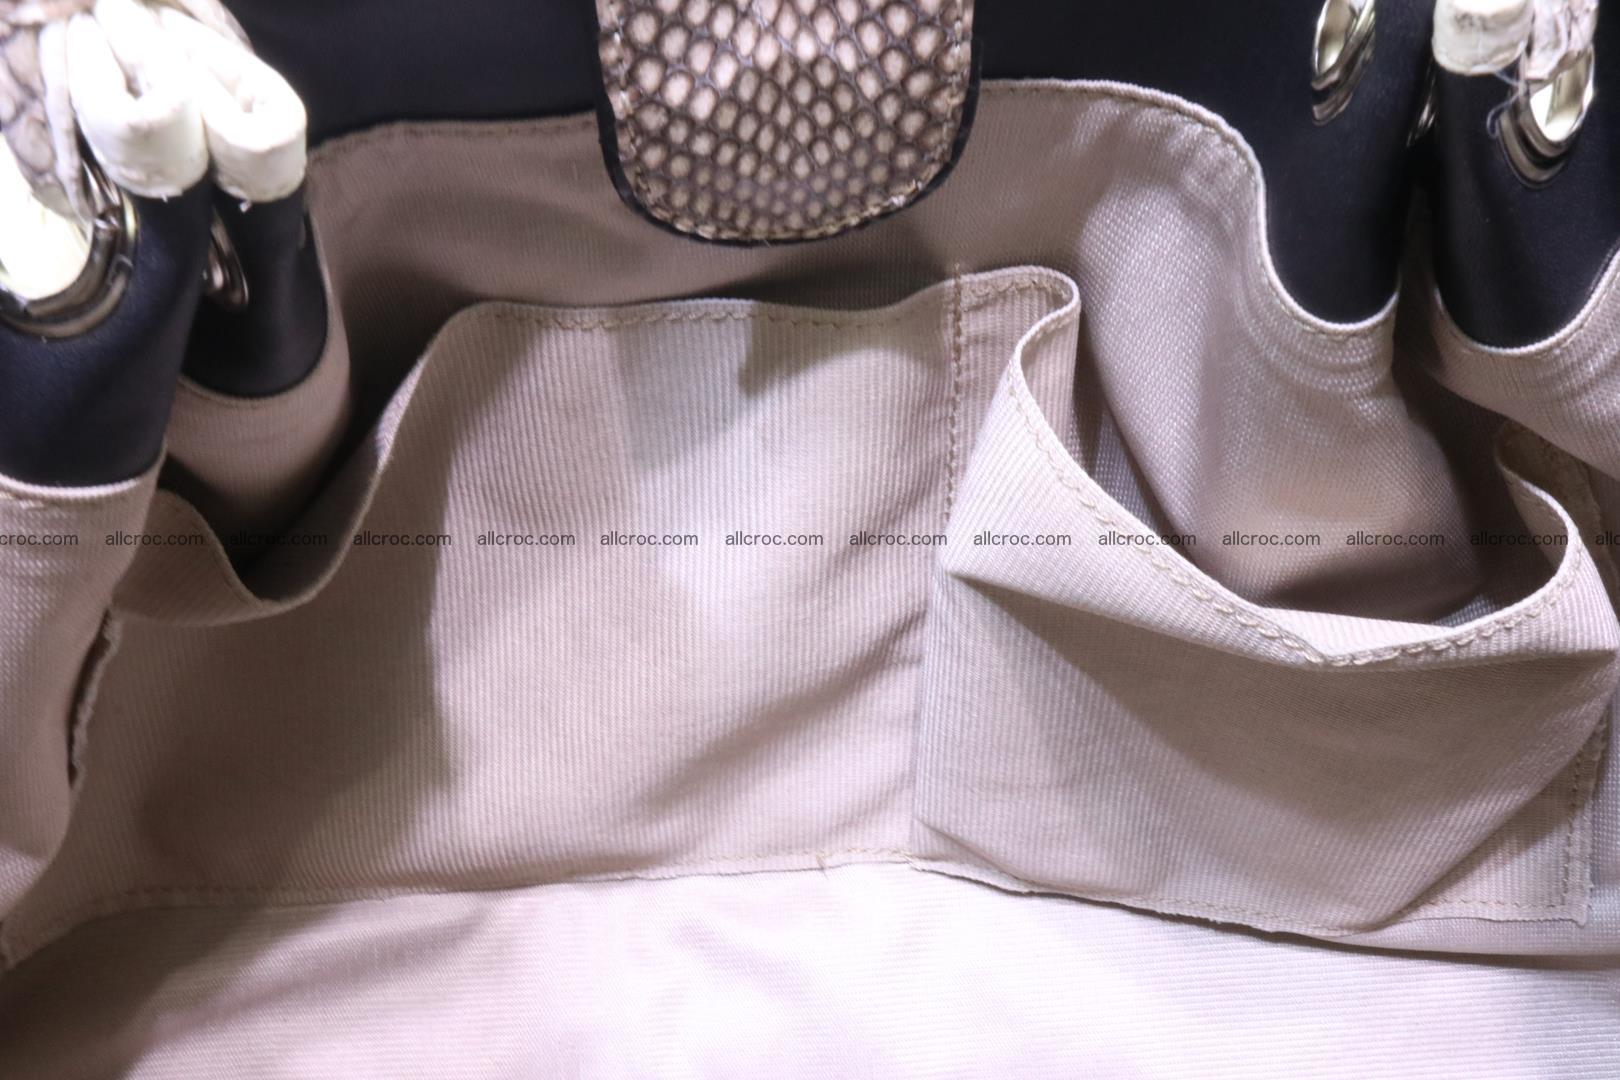 Handbag for lady from cobra skin with cobra head 168 Foto 17